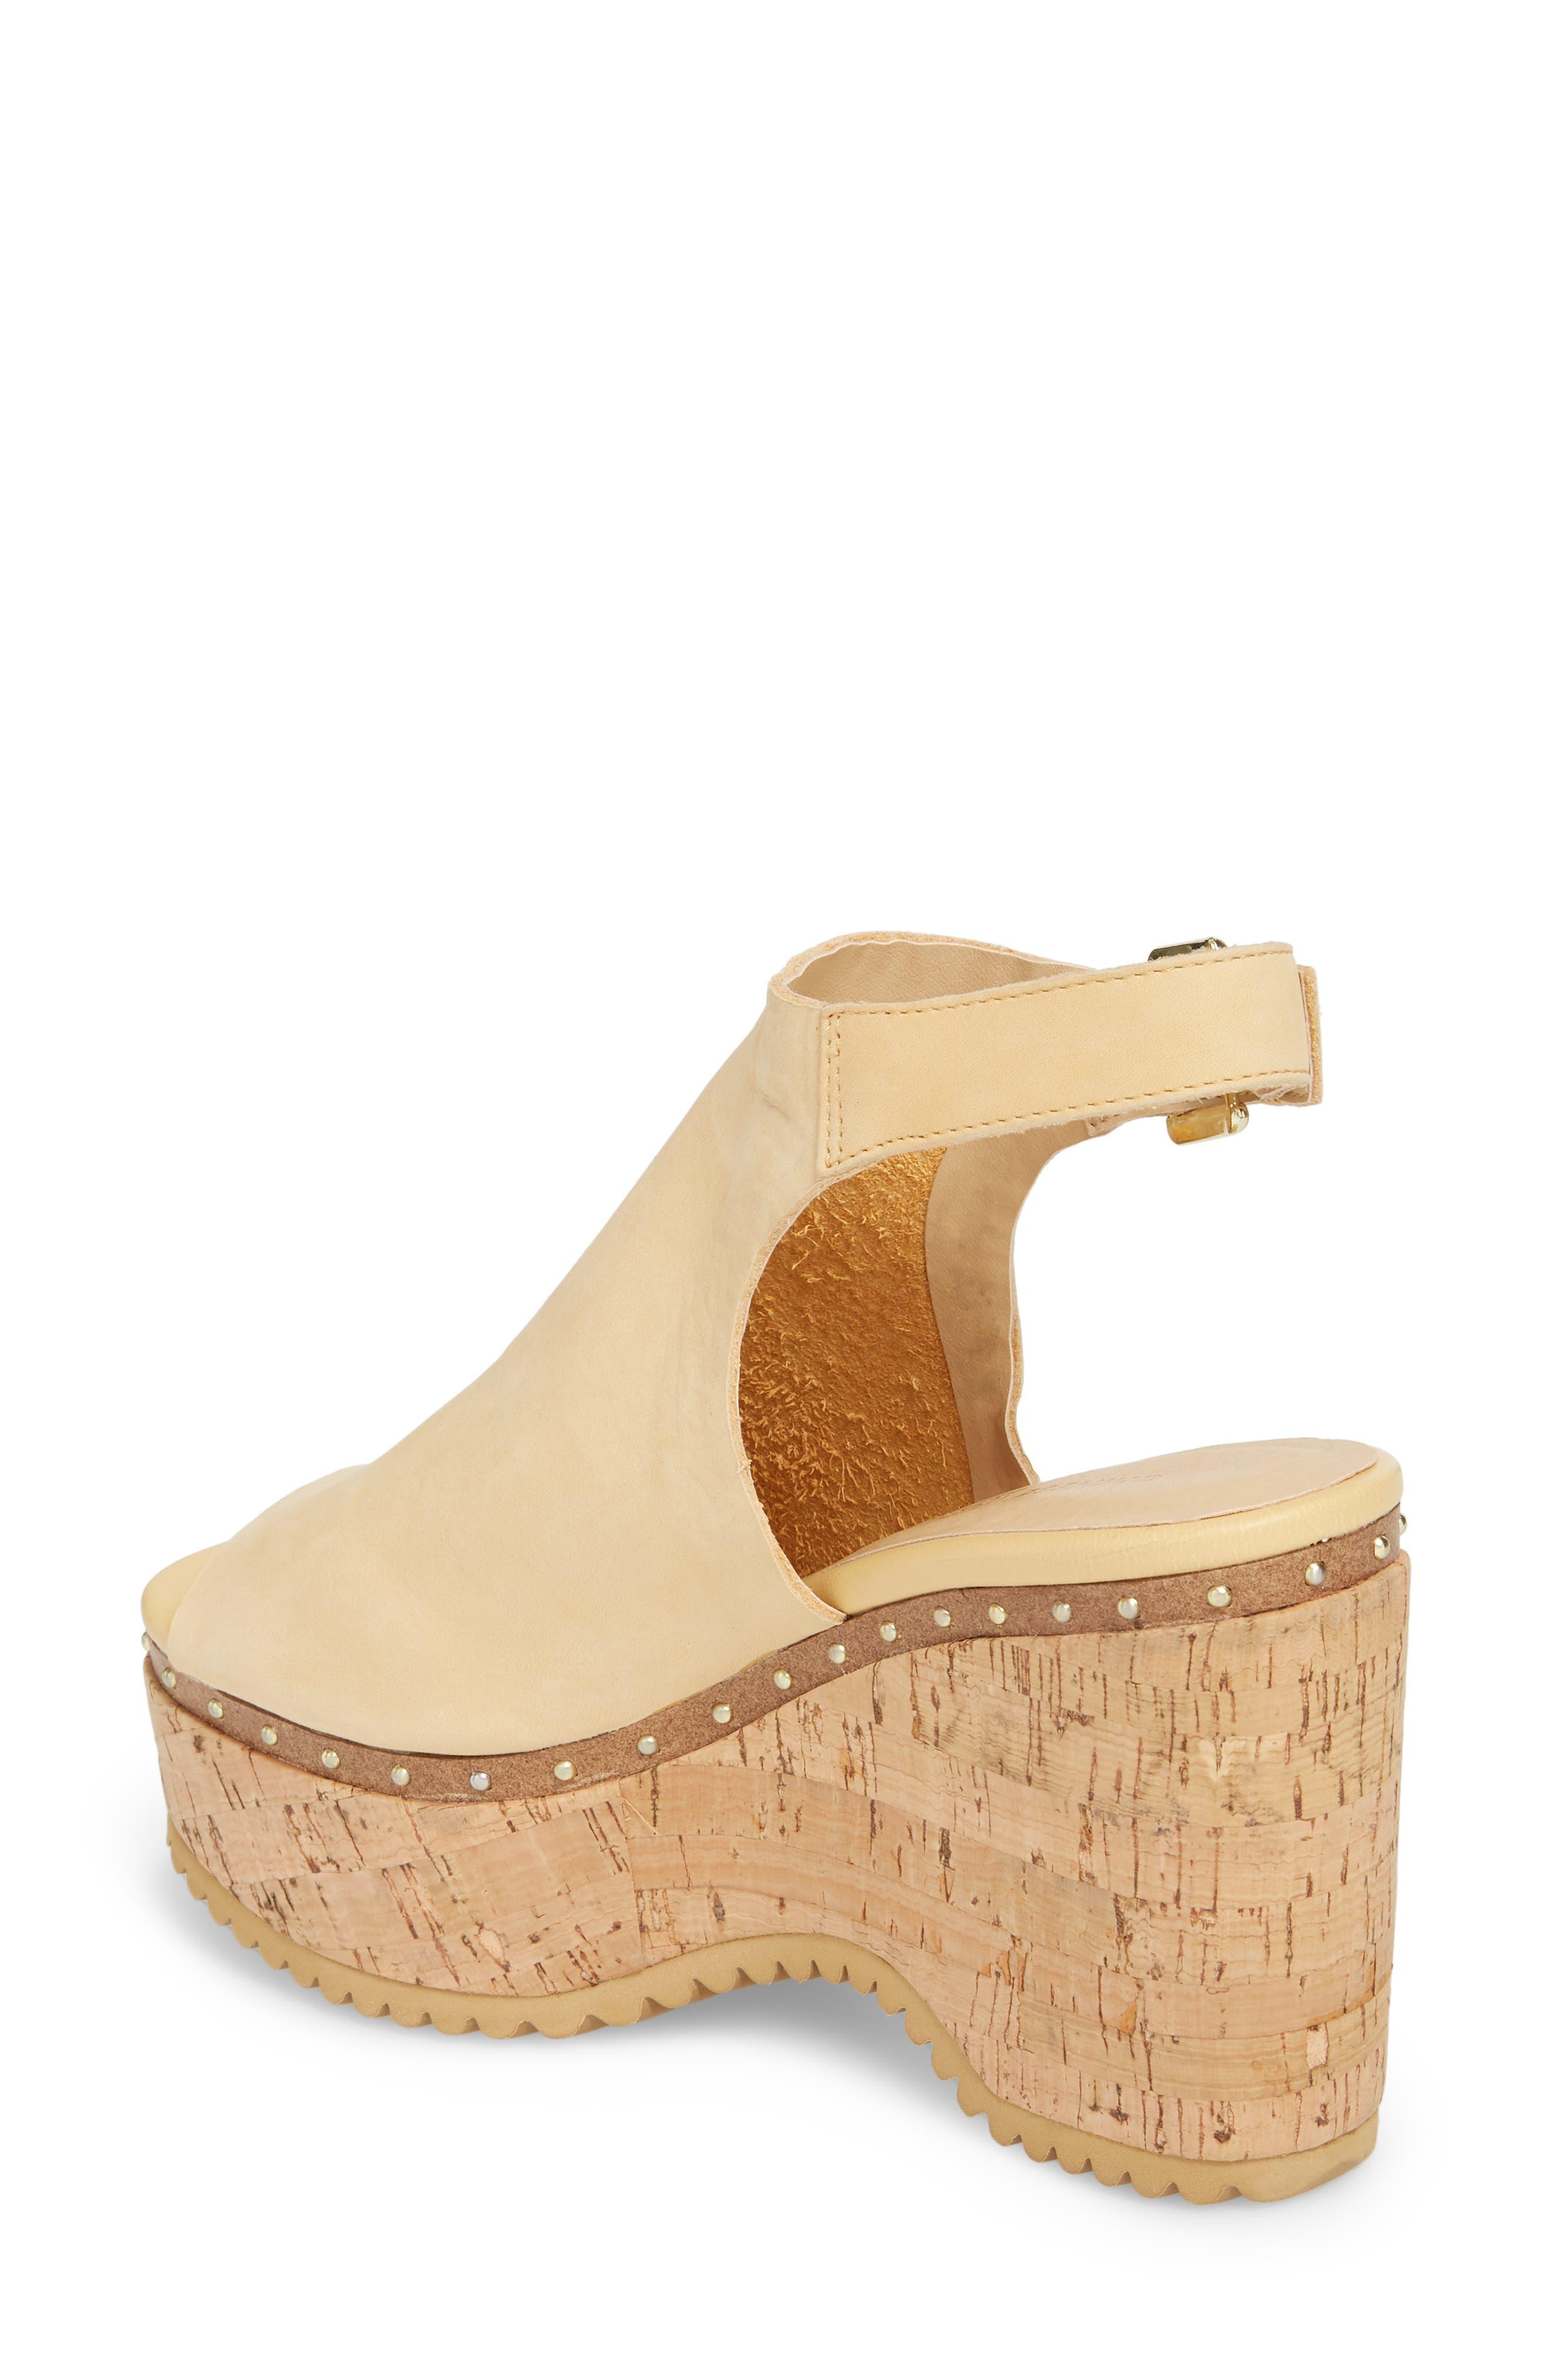 Trinity Studded Platform Sandal,                             Alternate thumbnail 2, color,                             Cream